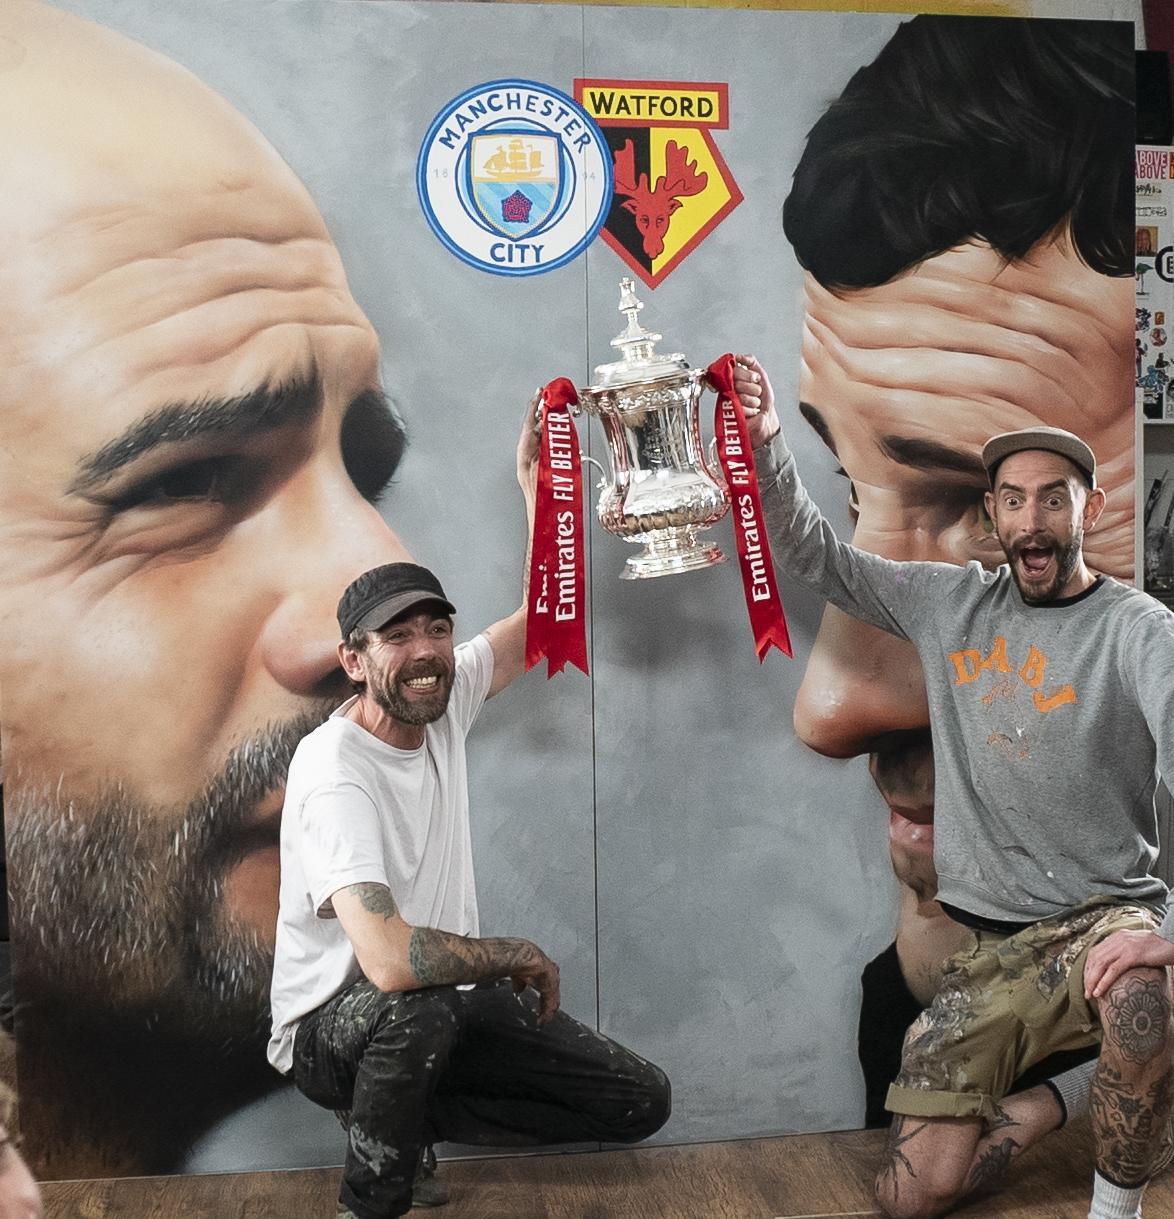 FA CUP FINAL IMAGE #2.jpg